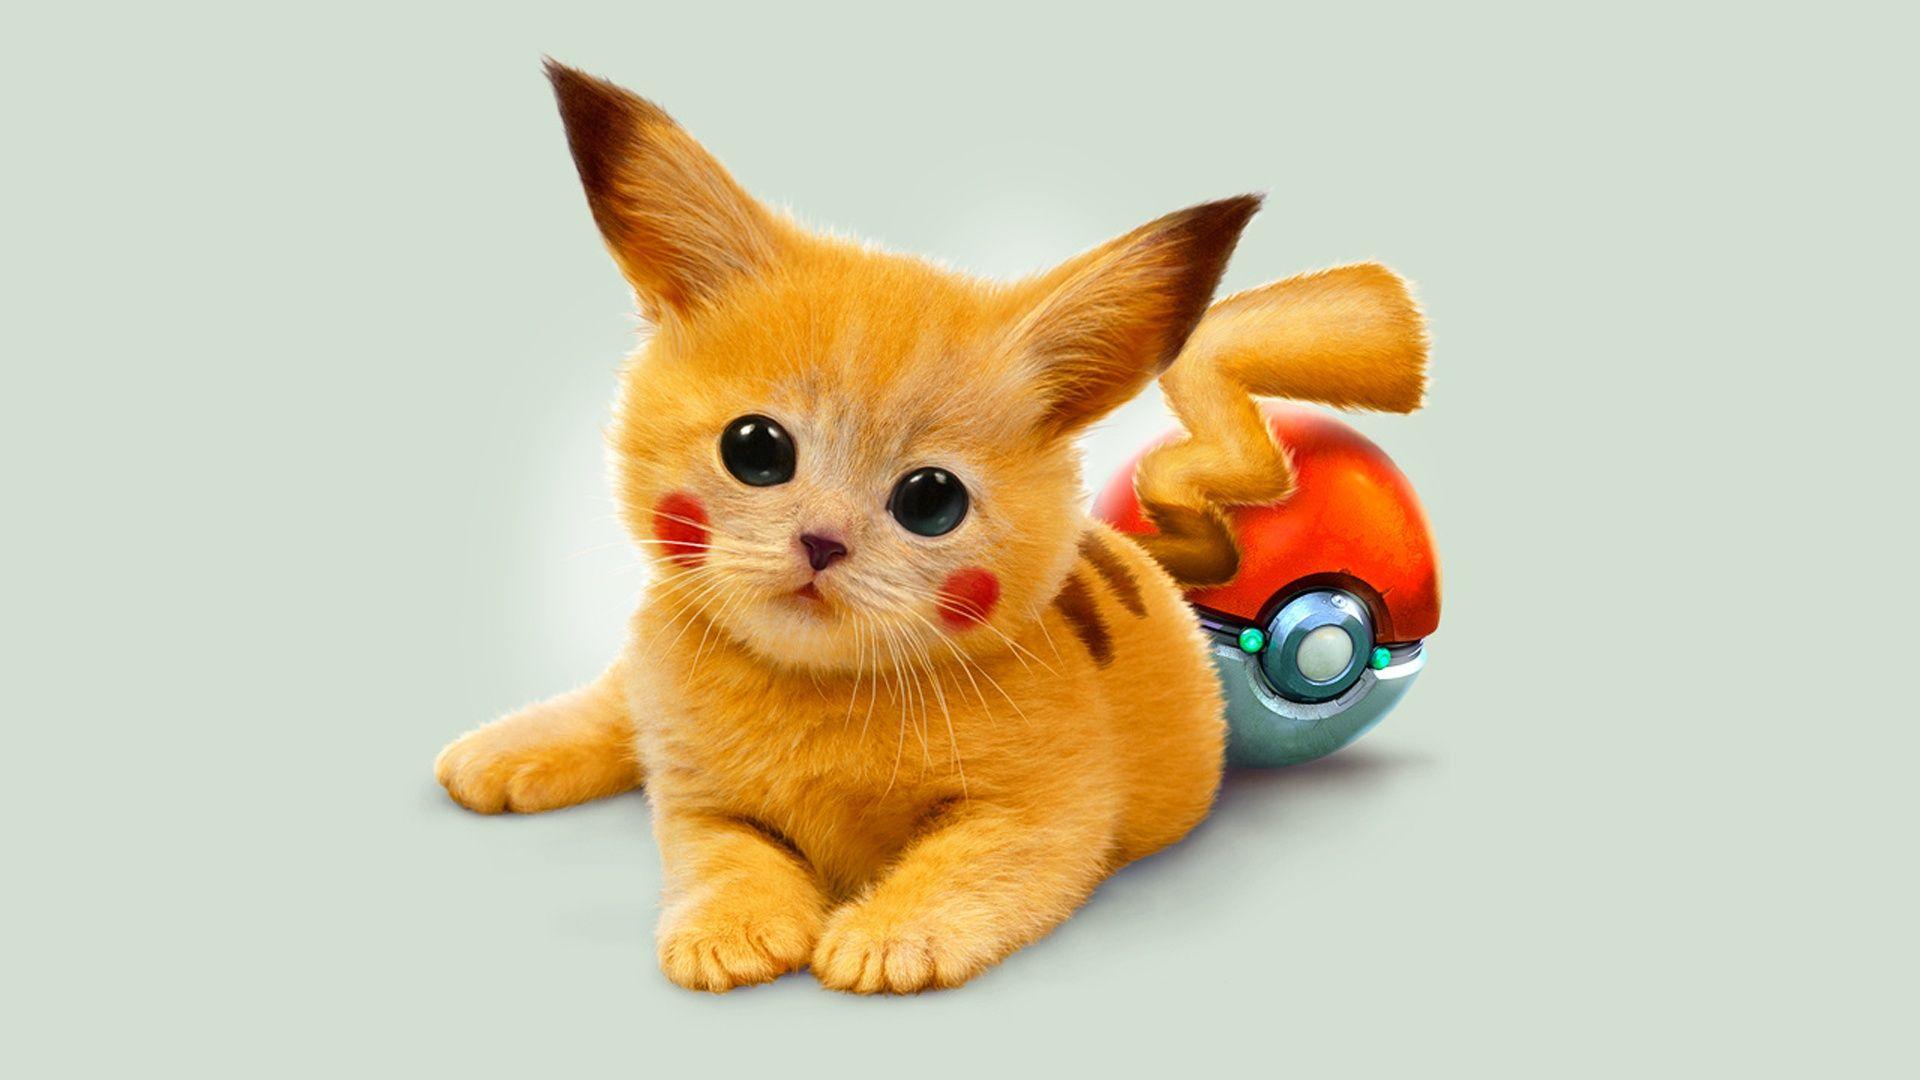 Pokemon Cartoon Pikachu Hintergrundbilder 1920x1080 Susse Tiere Baby Katzen Katzenhumor